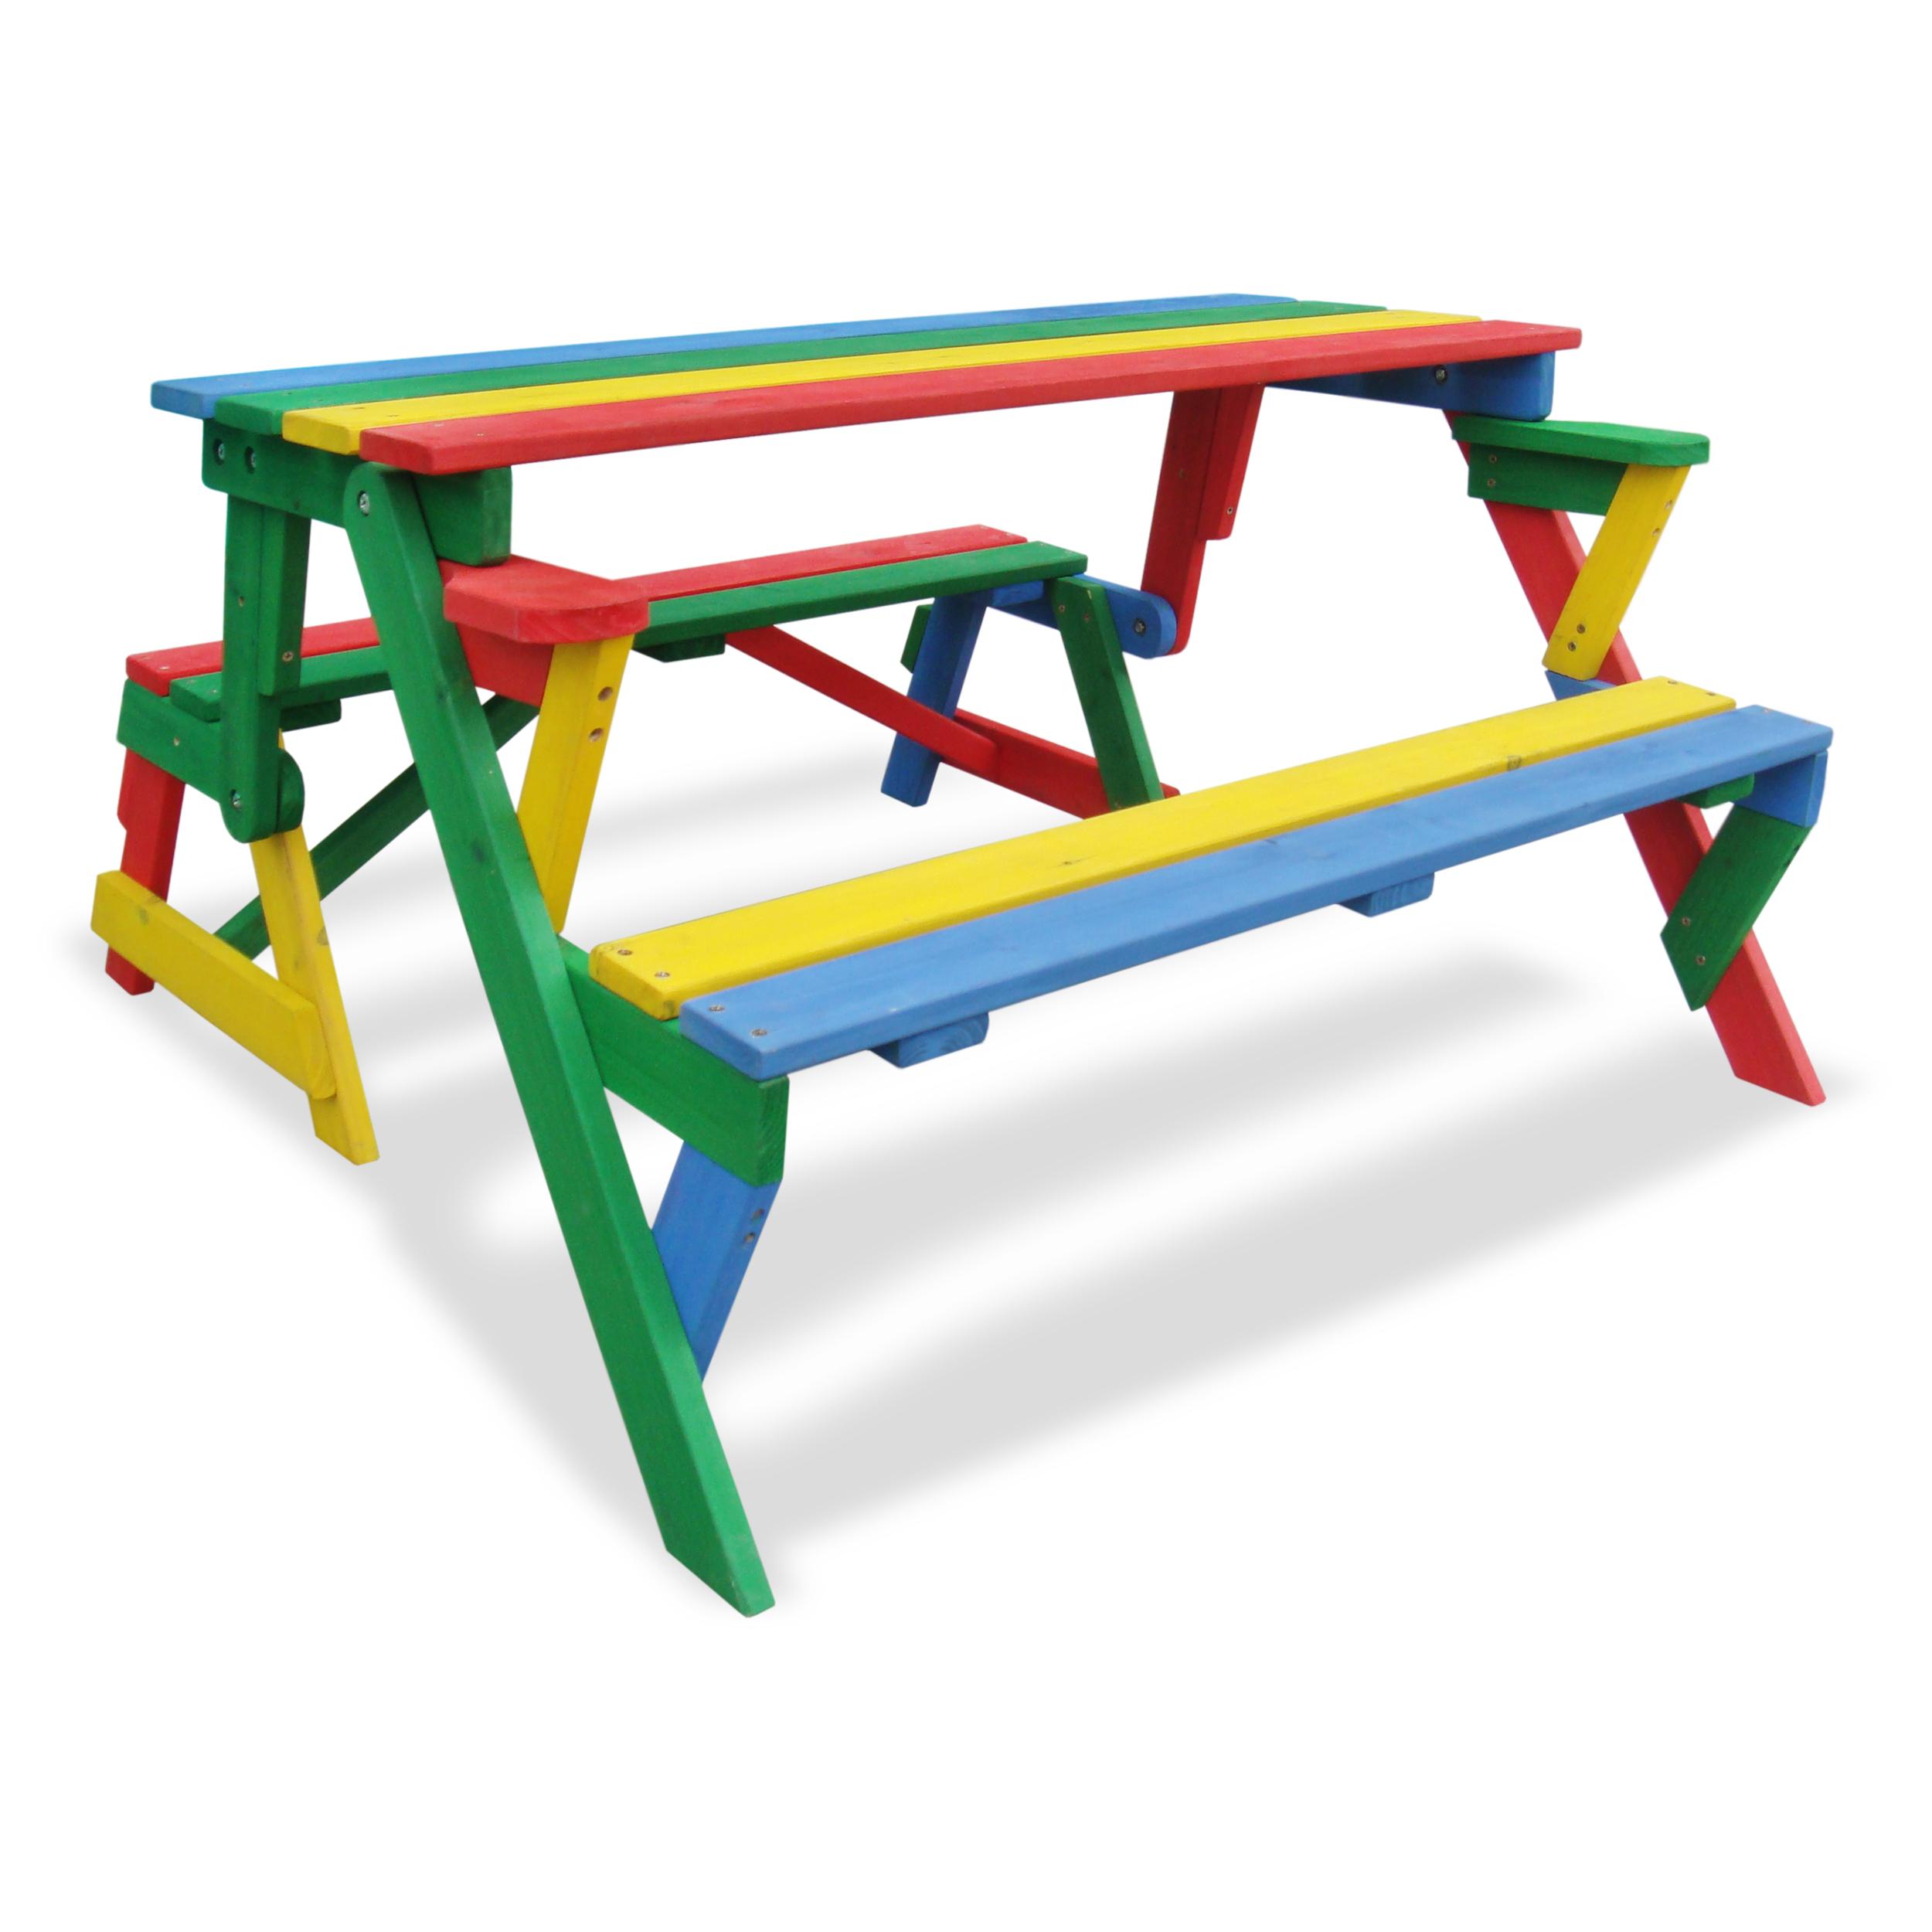 HABAU Kinderpicknickbank in rot, grün, gelb und blau, als Picknickbank